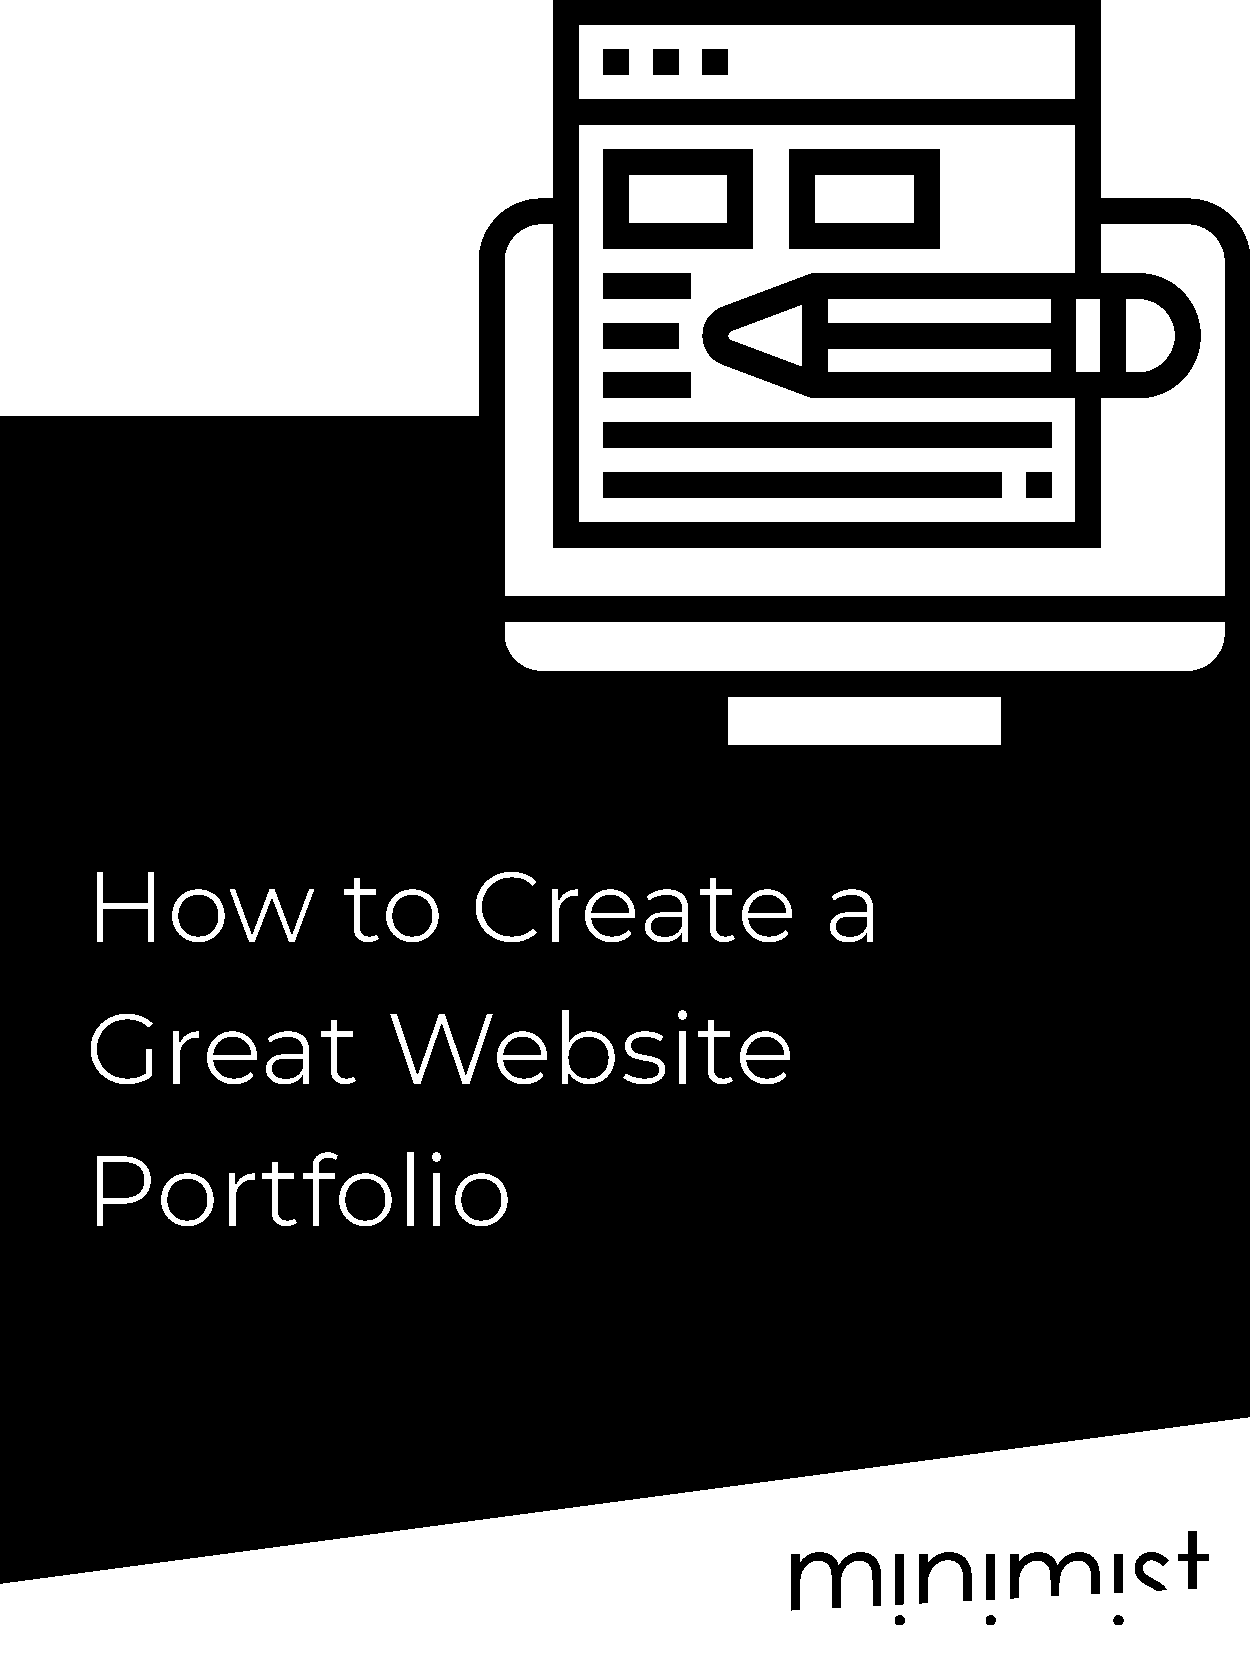 How to Create a Great Website Portfolio